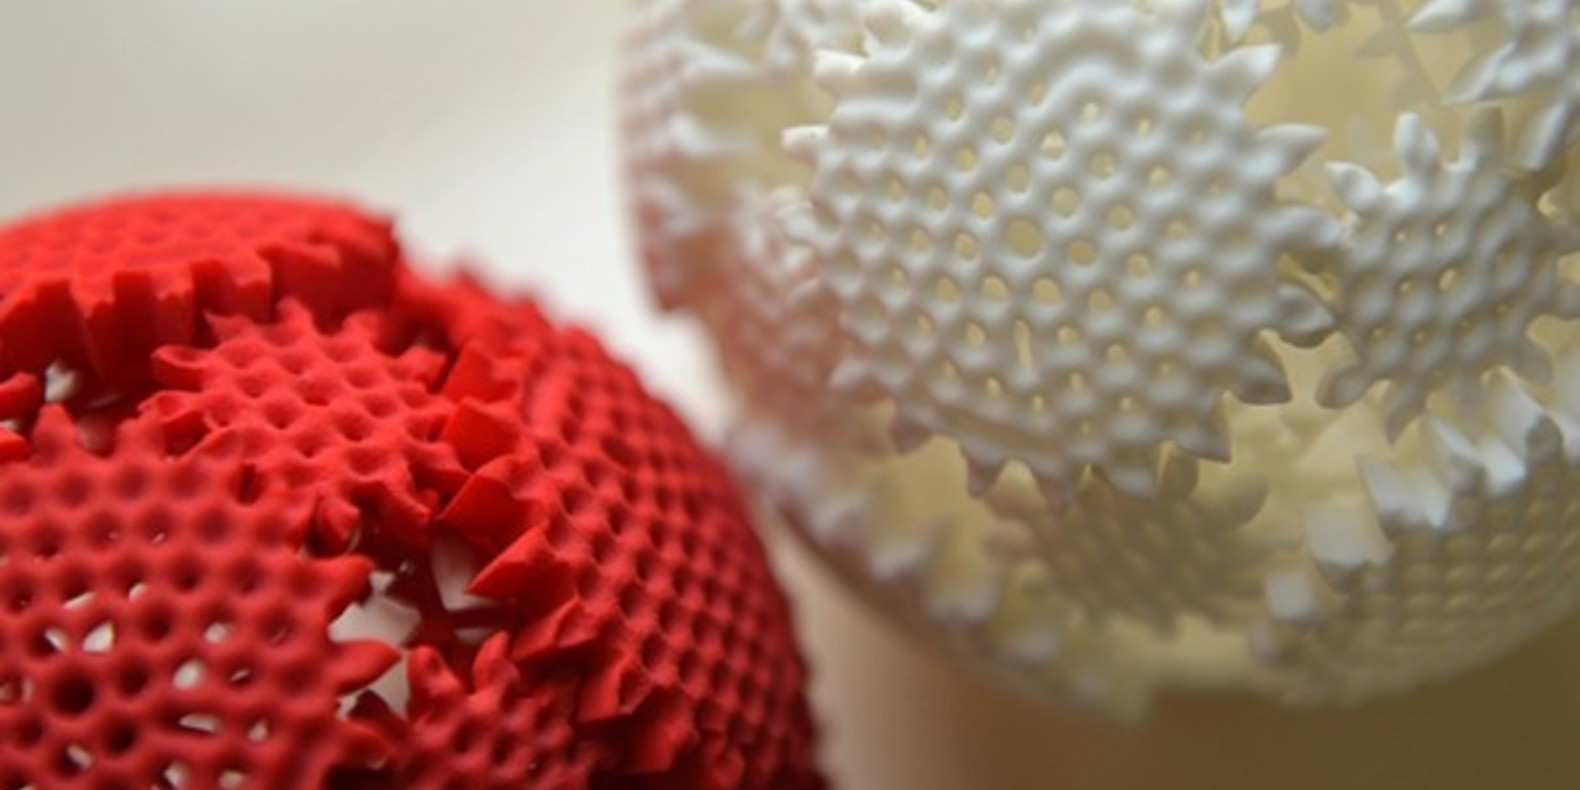 machaneu v1 proxy design studio 3D printing cults 3D impression objet impressionnant 3